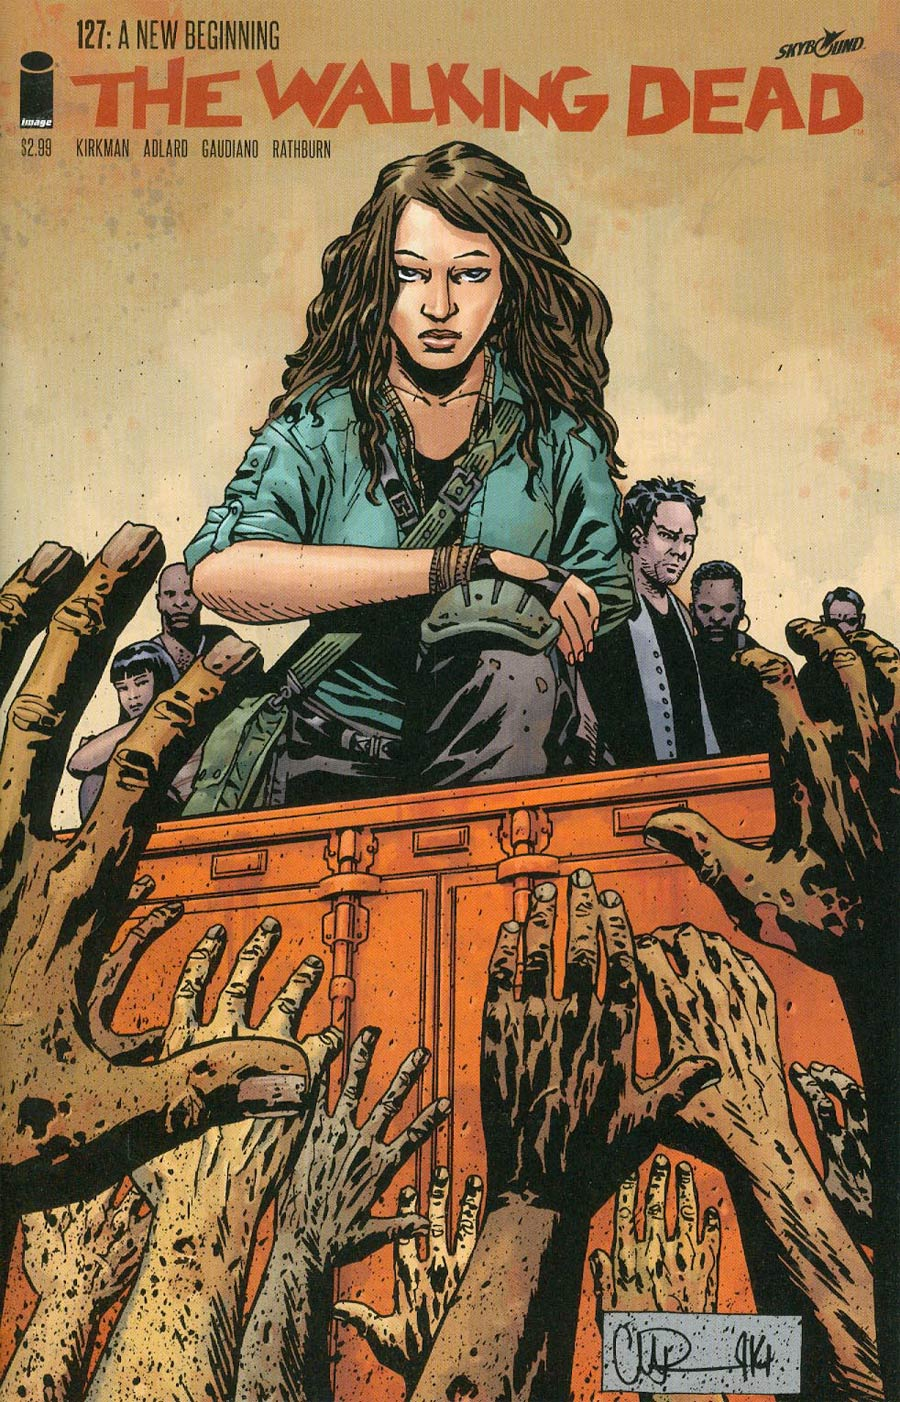 Walking Dead #127 Cover A 1st Ptg Regular Charlie Adlard Cover